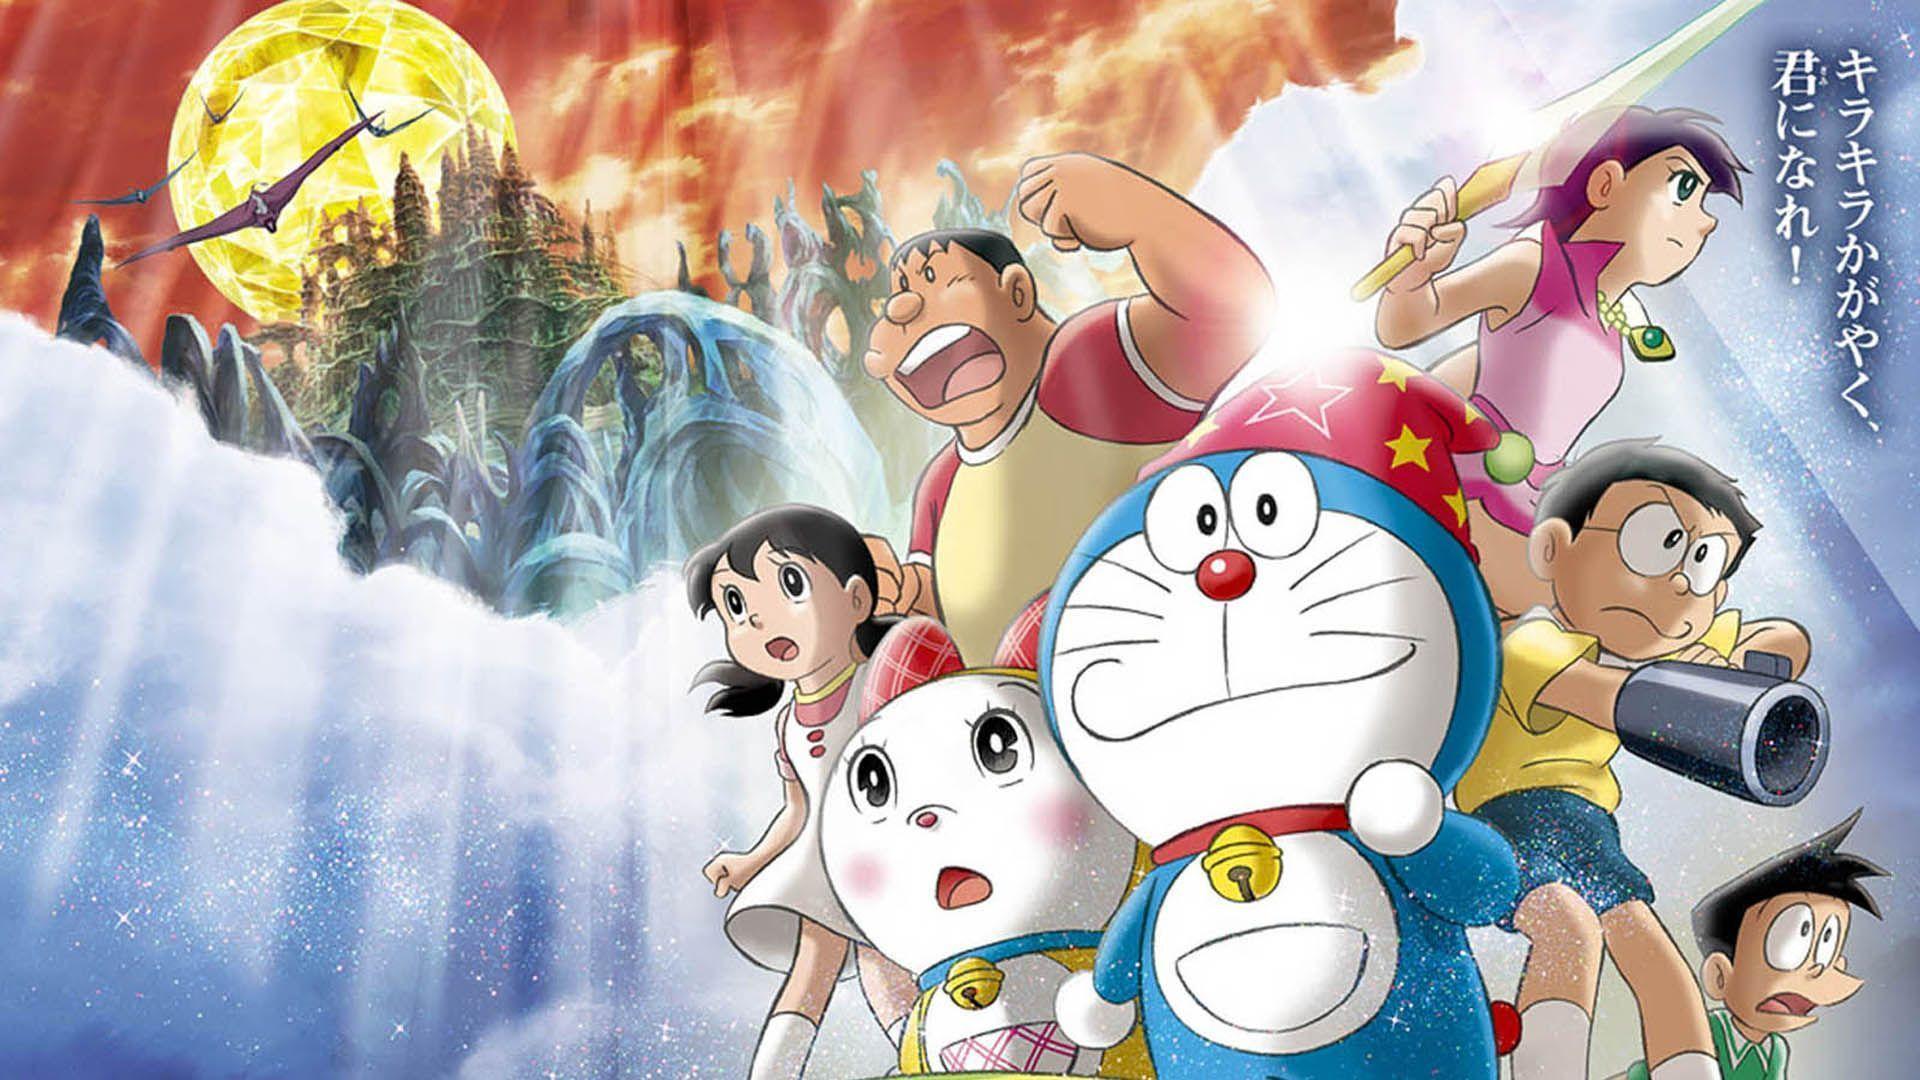 Doraemon HD Wallpapers for Laptop